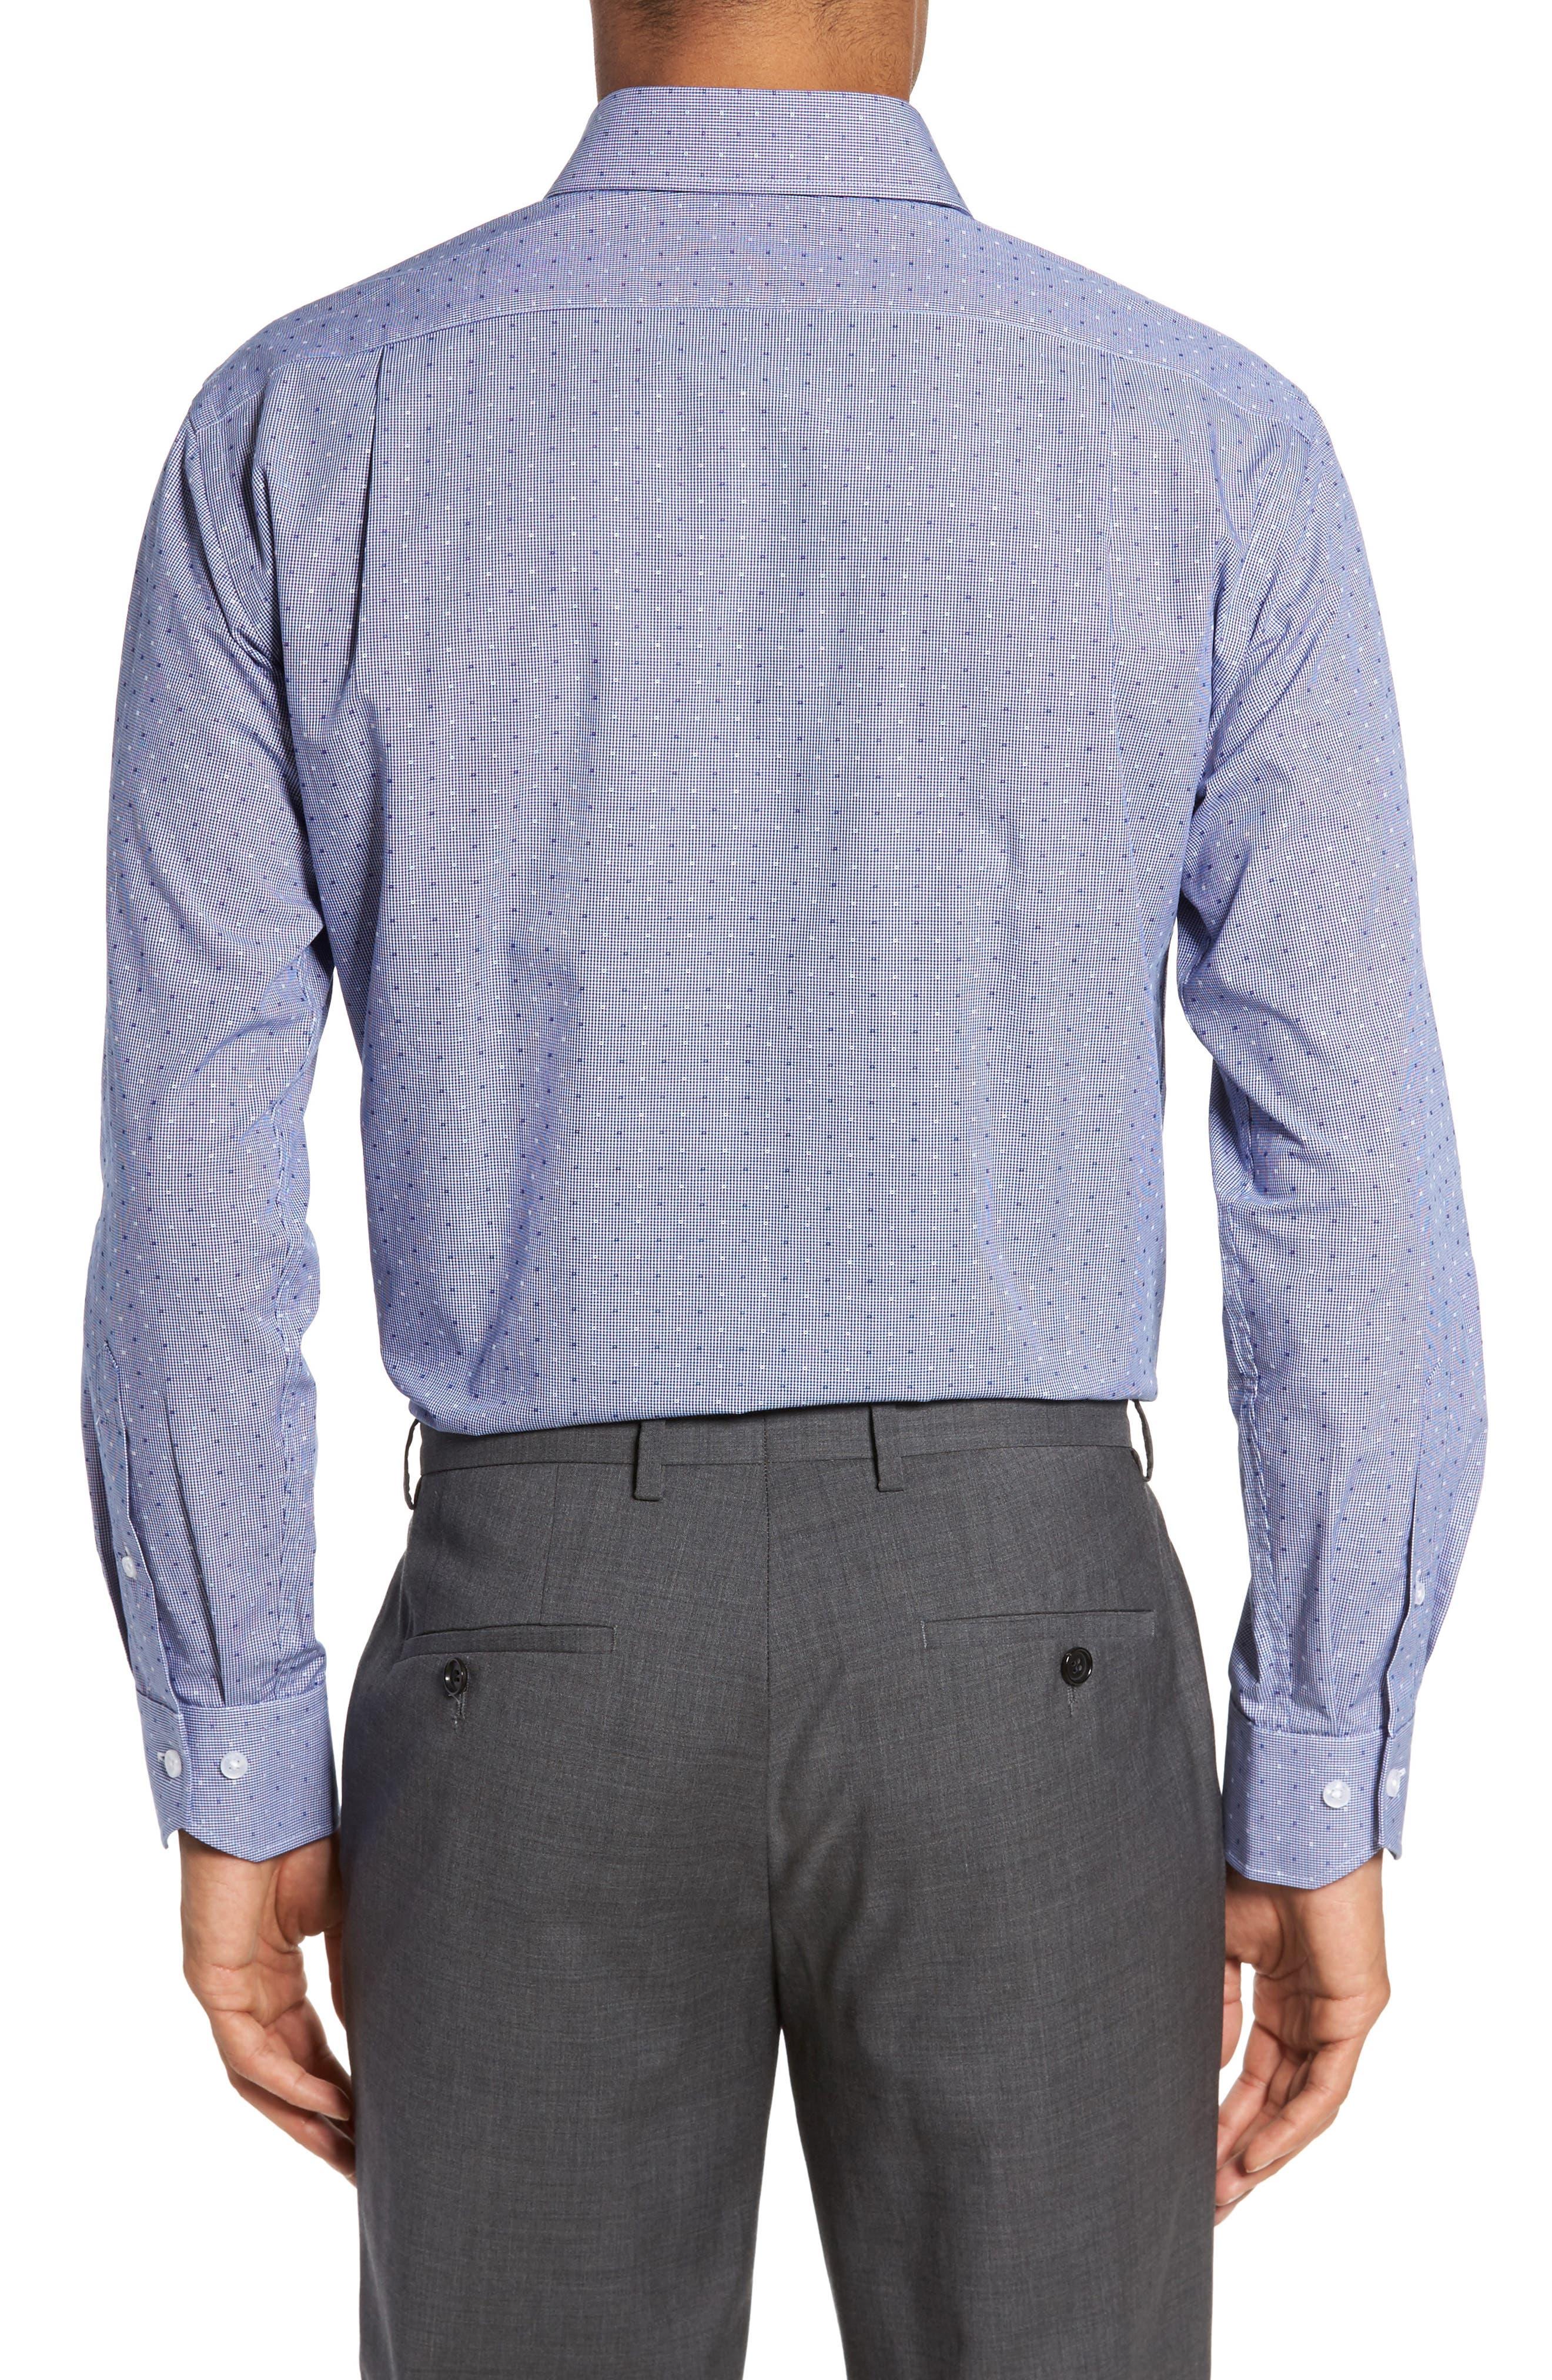 LORENZO UOMO, Trim Fit Check Dress Shirt, Alternate thumbnail 2, color, NAVY